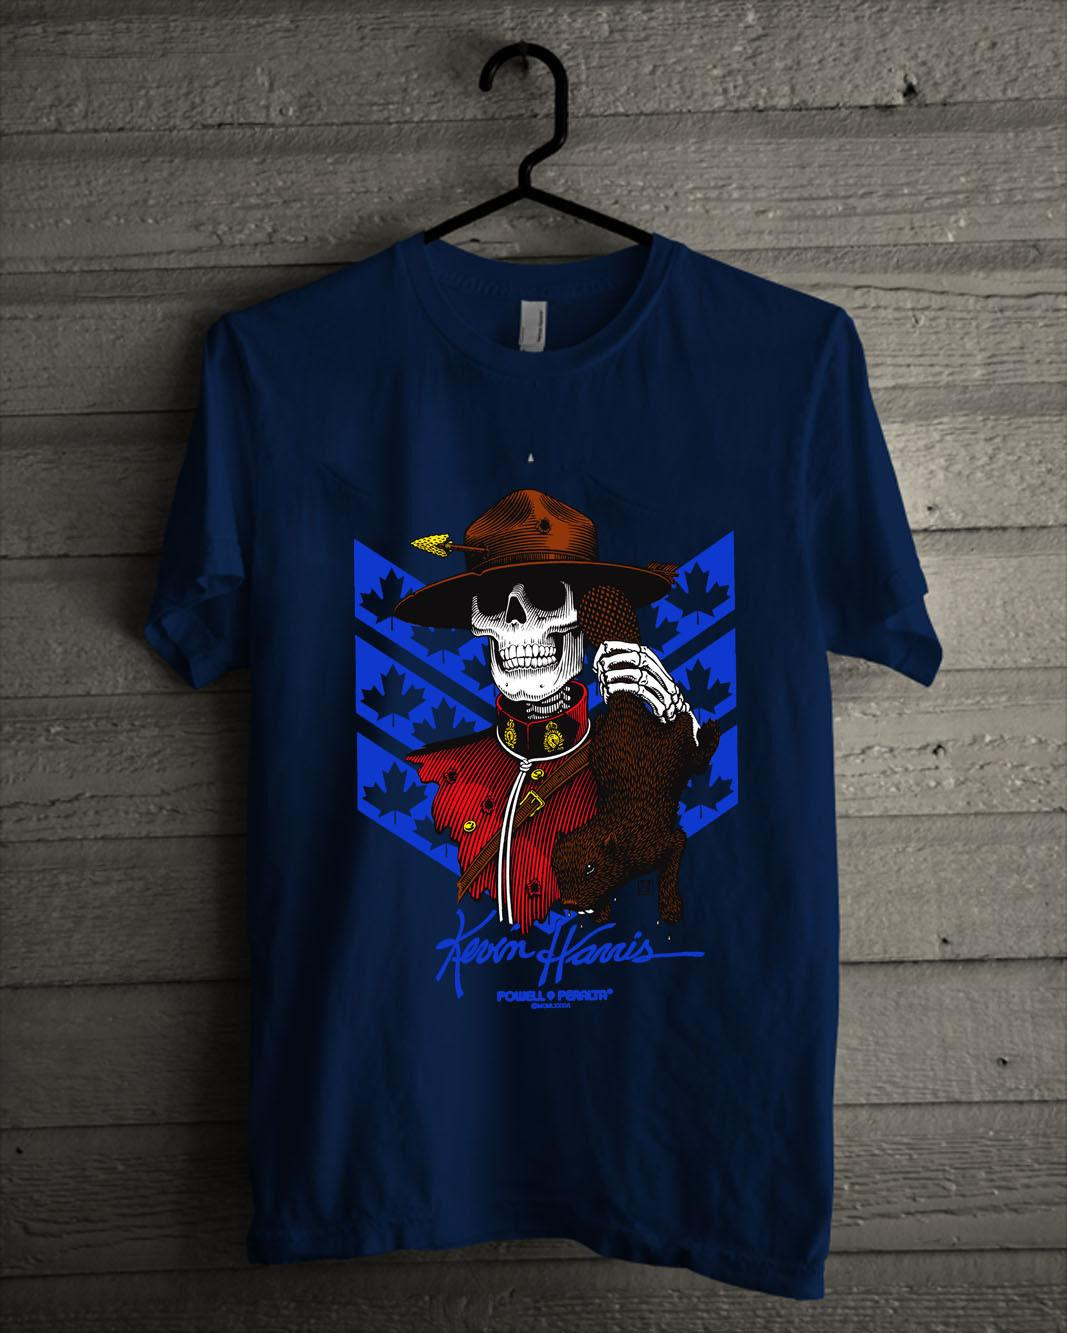 606056ba Powell Peralta Kevin Harris T Shirt Men'S All Size Blue T Shirt Mens 1  Custom Made Good Quality T Shirt Top Tee Tie Shirts Latest T Shirt Designs  From ...